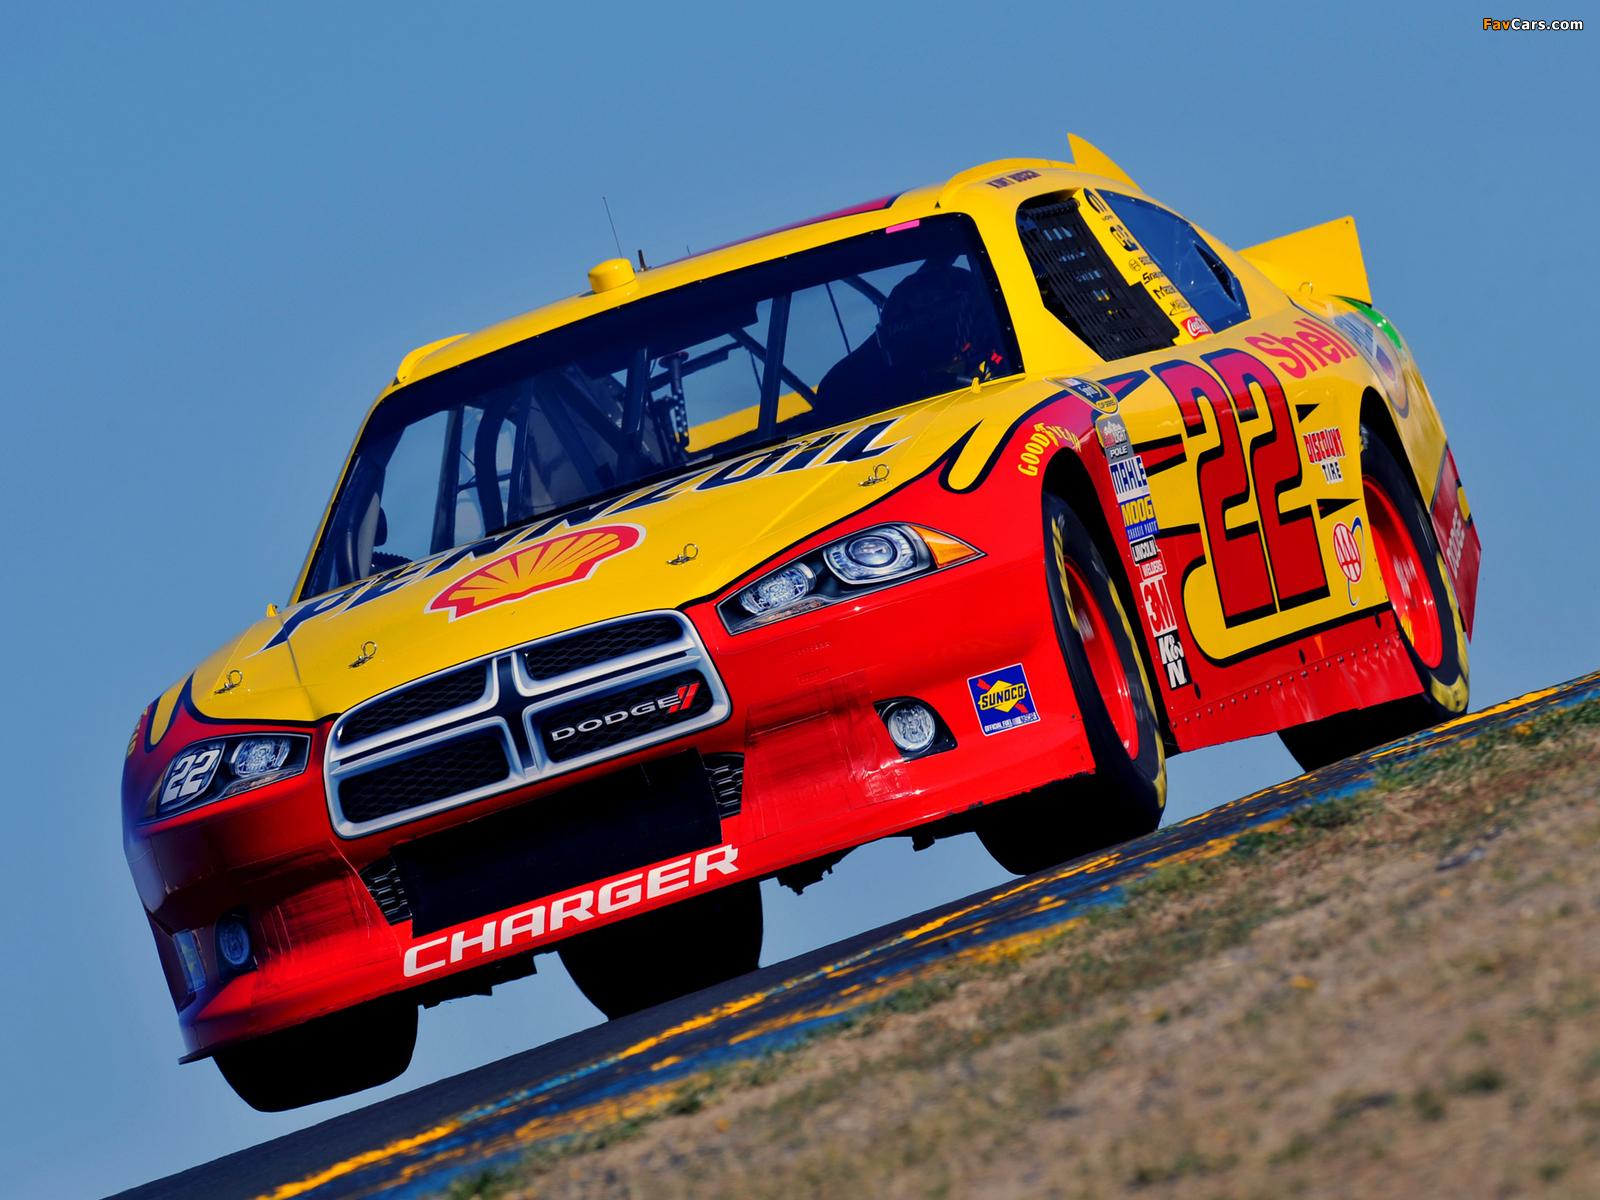 Dodge Charger NASCAR Sprint Cup Series Race Car 2011–12 images (1600 x 1200)